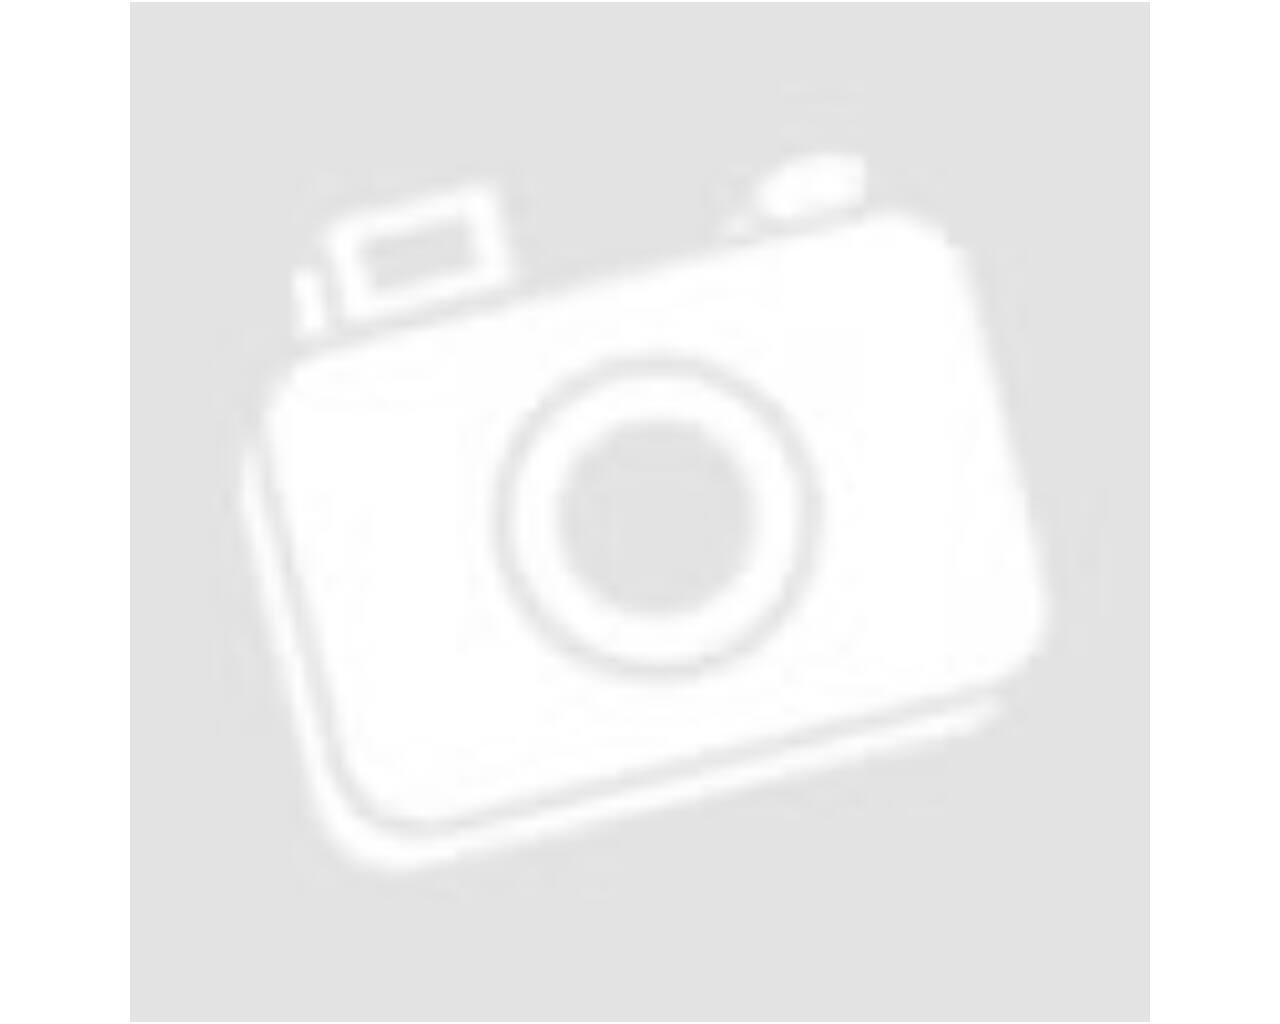 Metszőolló Bellota 210mm